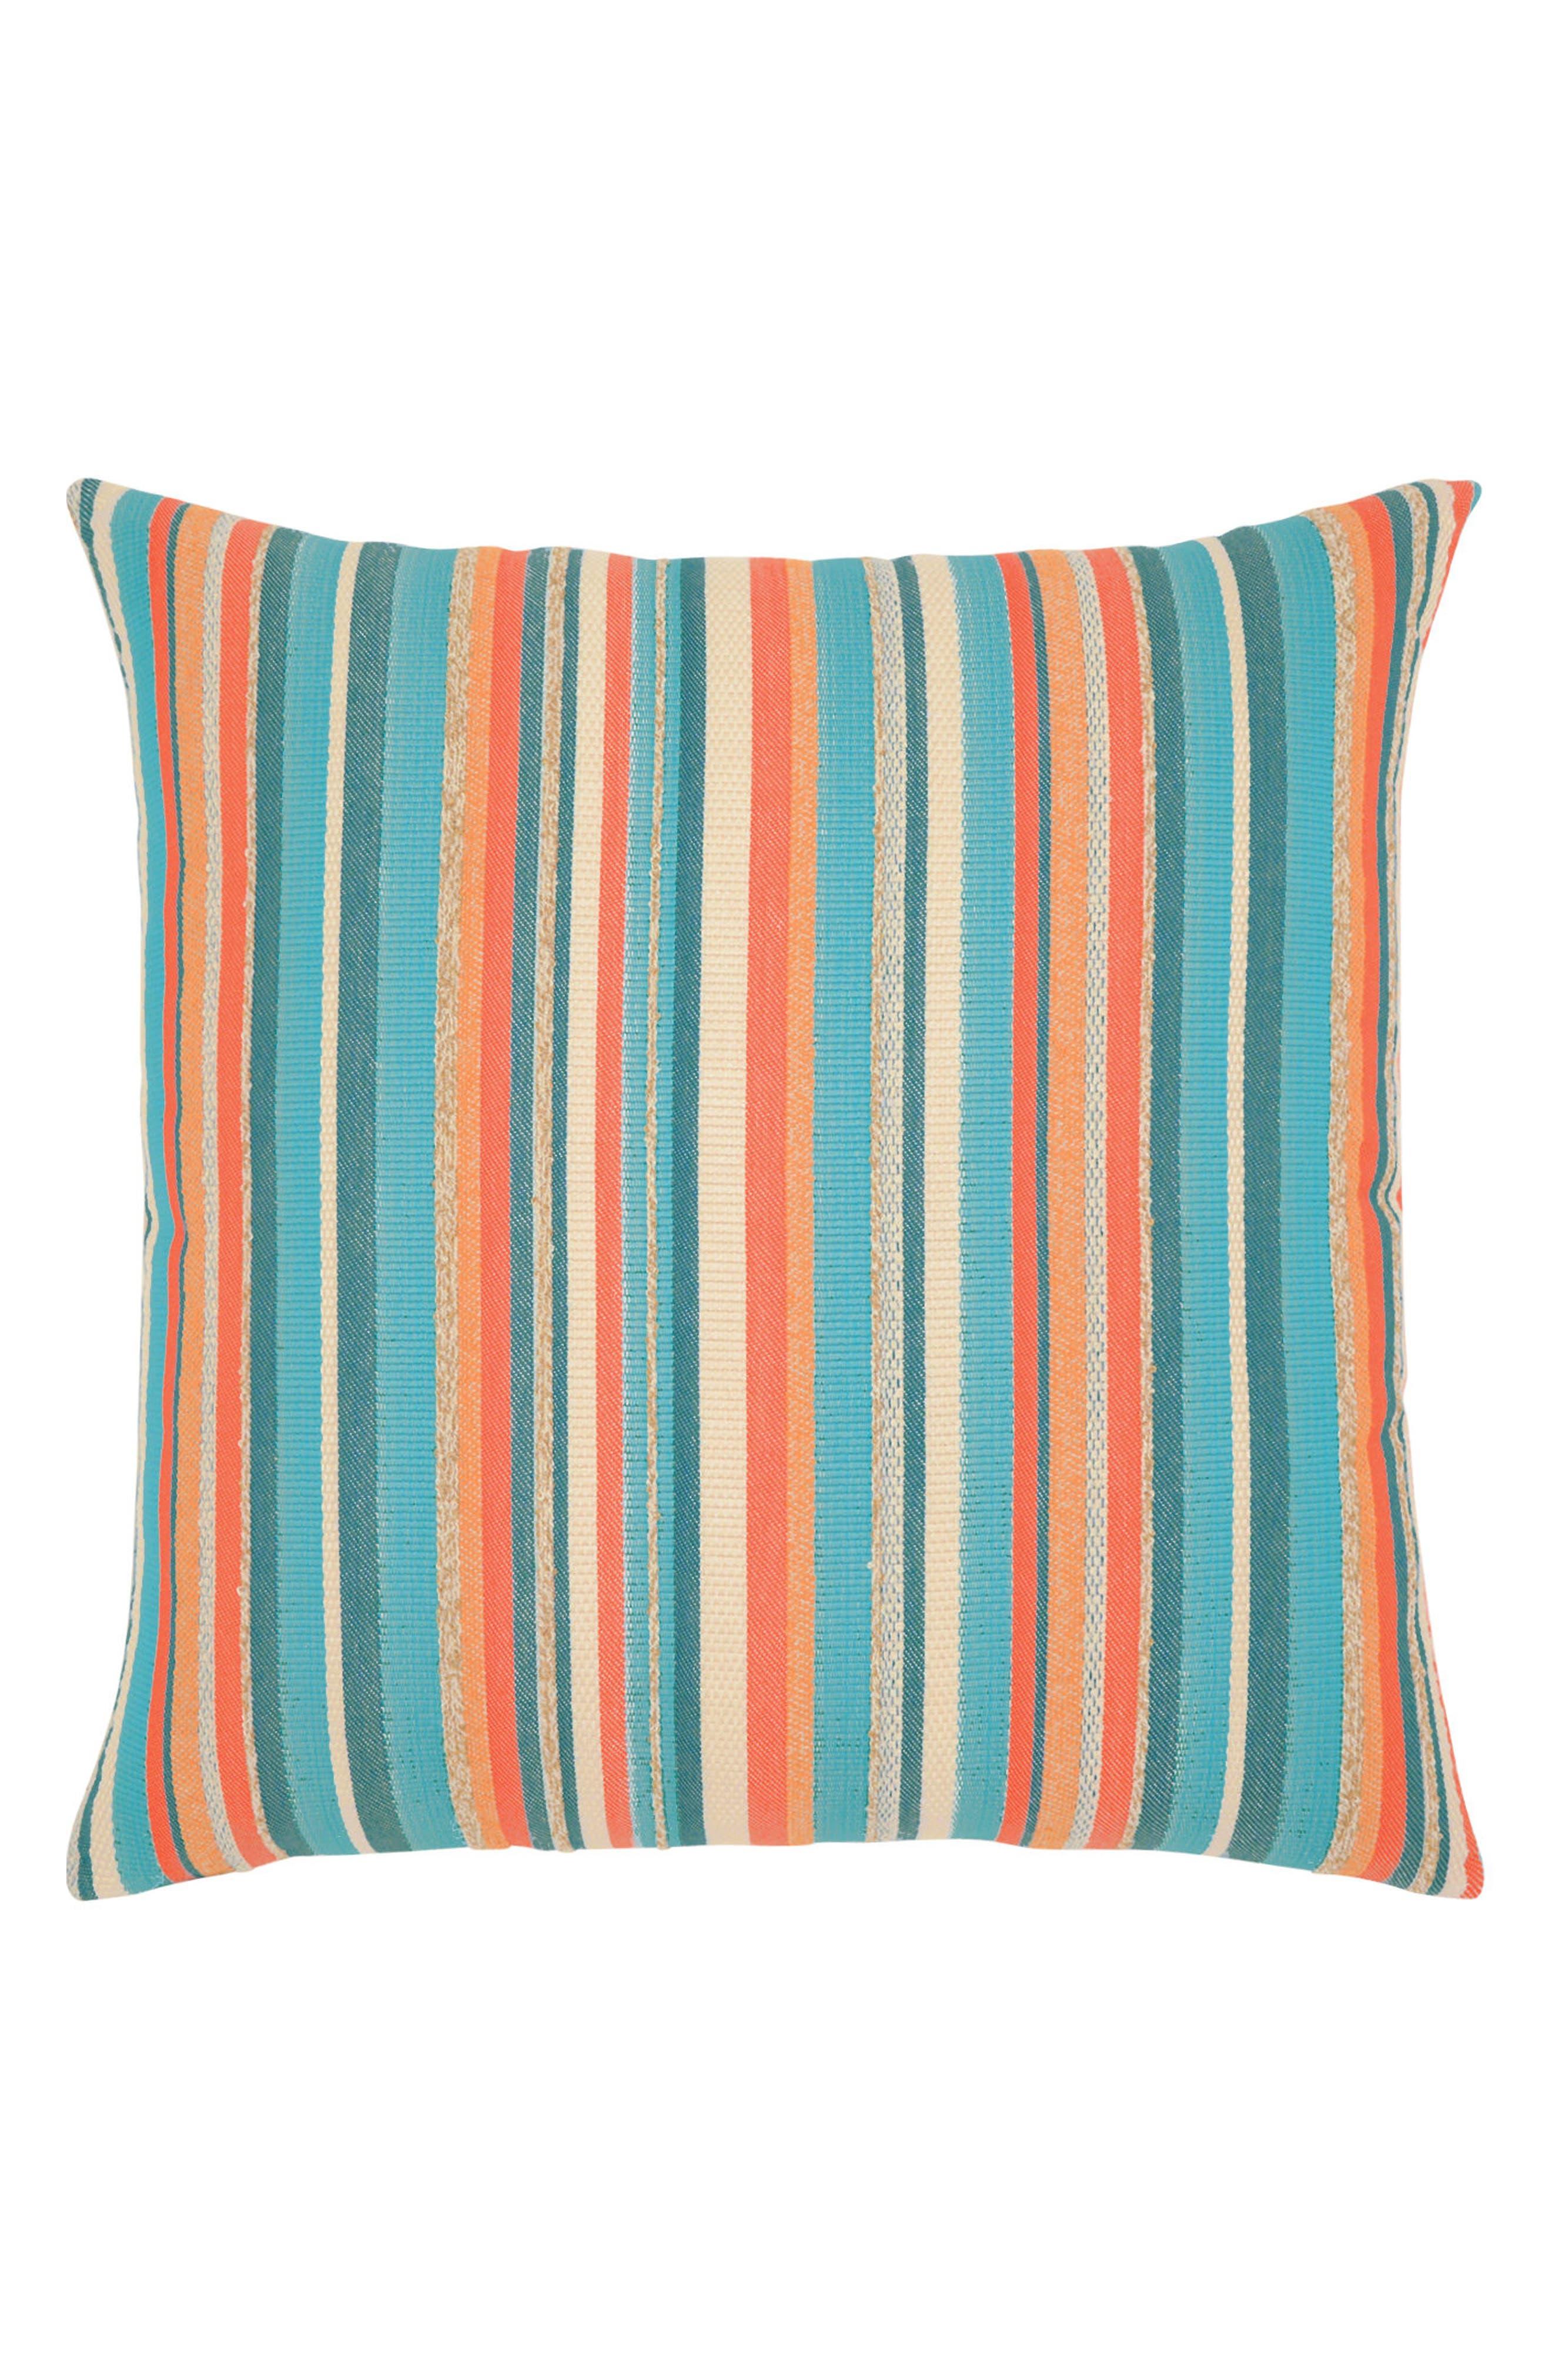 Grand Turk Stripe Indoor/Outdoor Accent Pillow,                         Main,                         color, 400